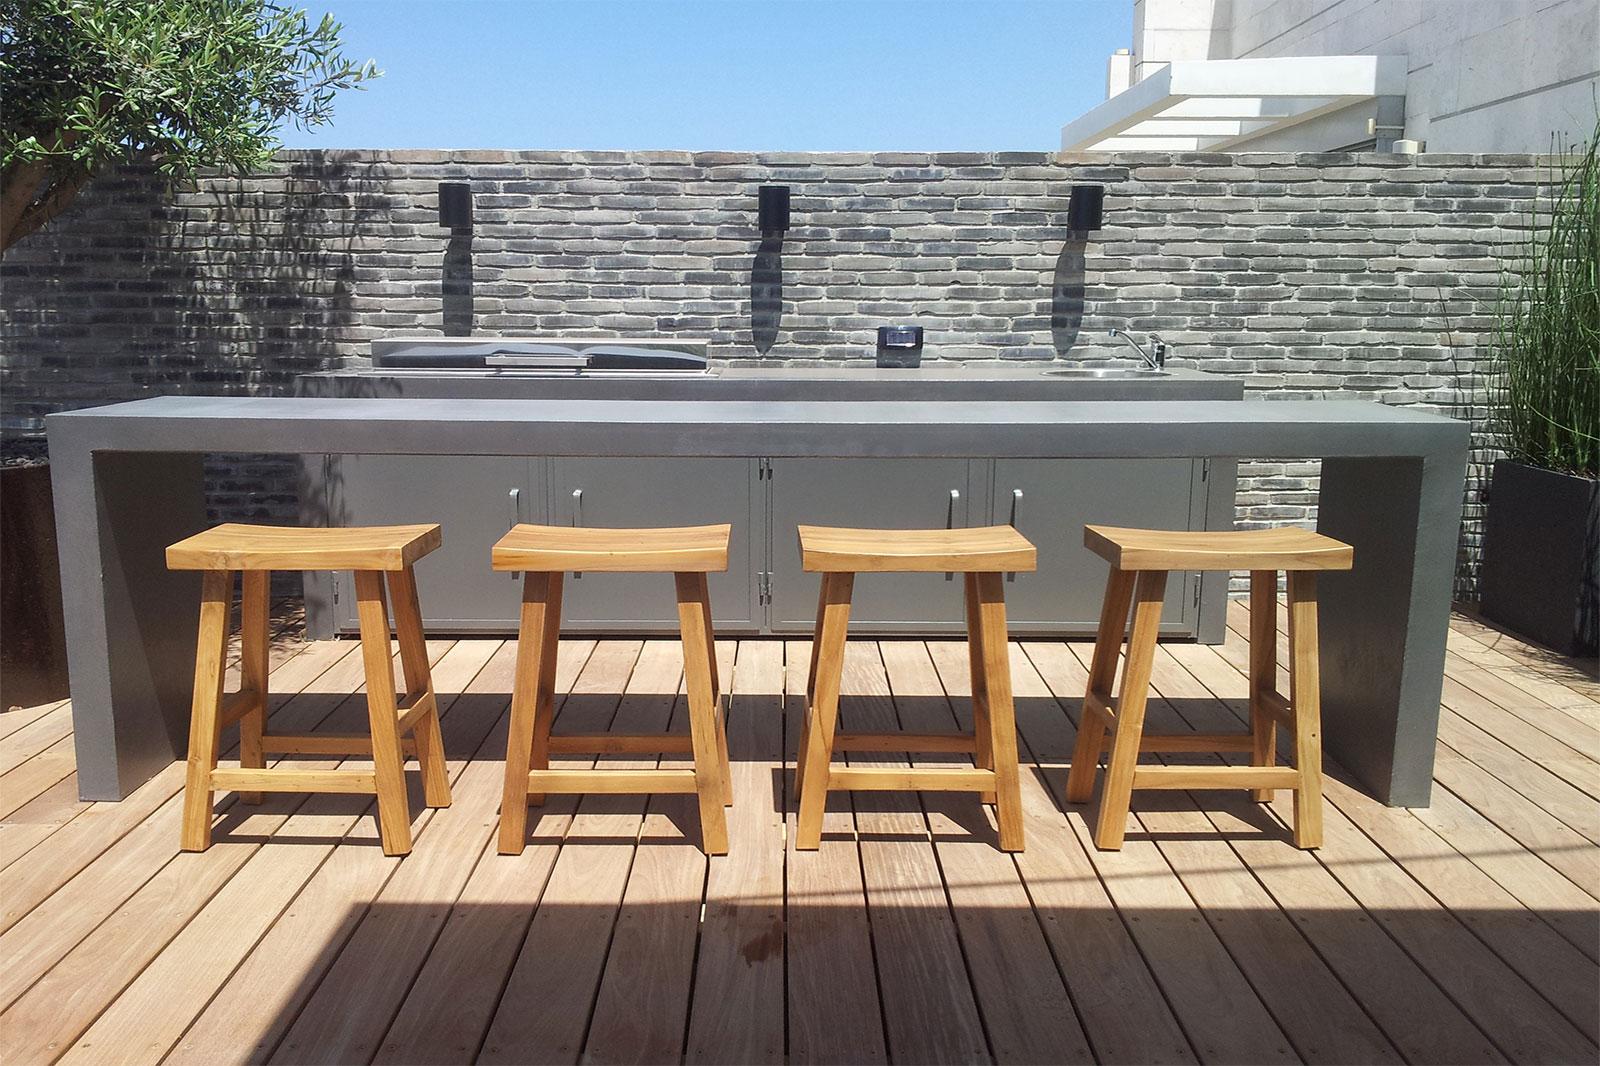 Concrete outdoor kitchen by BETONADA (23)